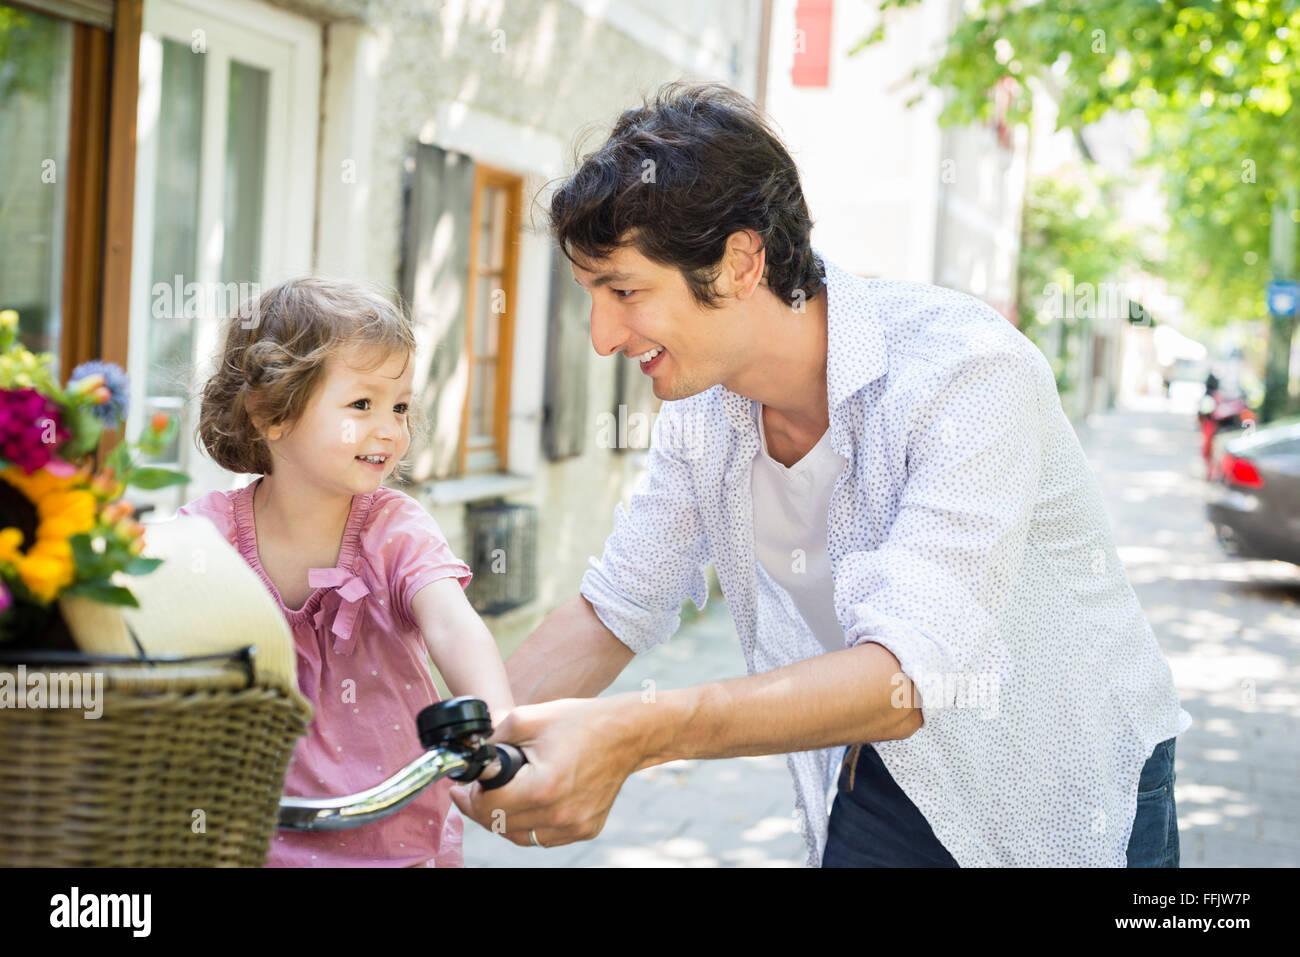 Padre e hija empujando bicicleta juntos Imagen De Stock